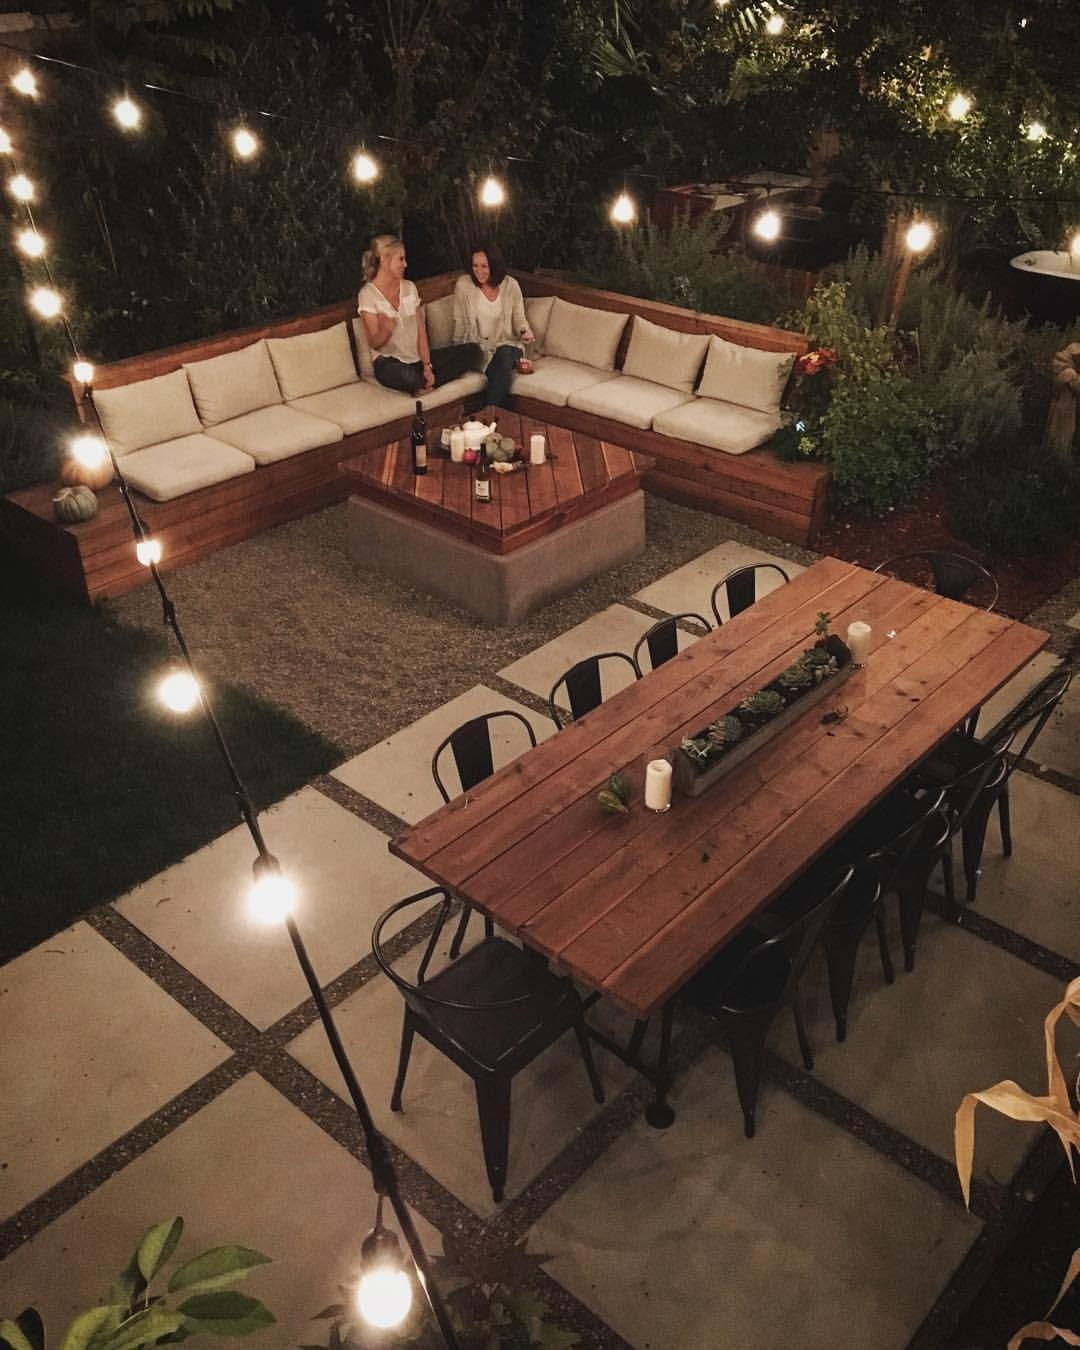 kyle hagerty on instagram u201cmy dream backyard is our backyard it